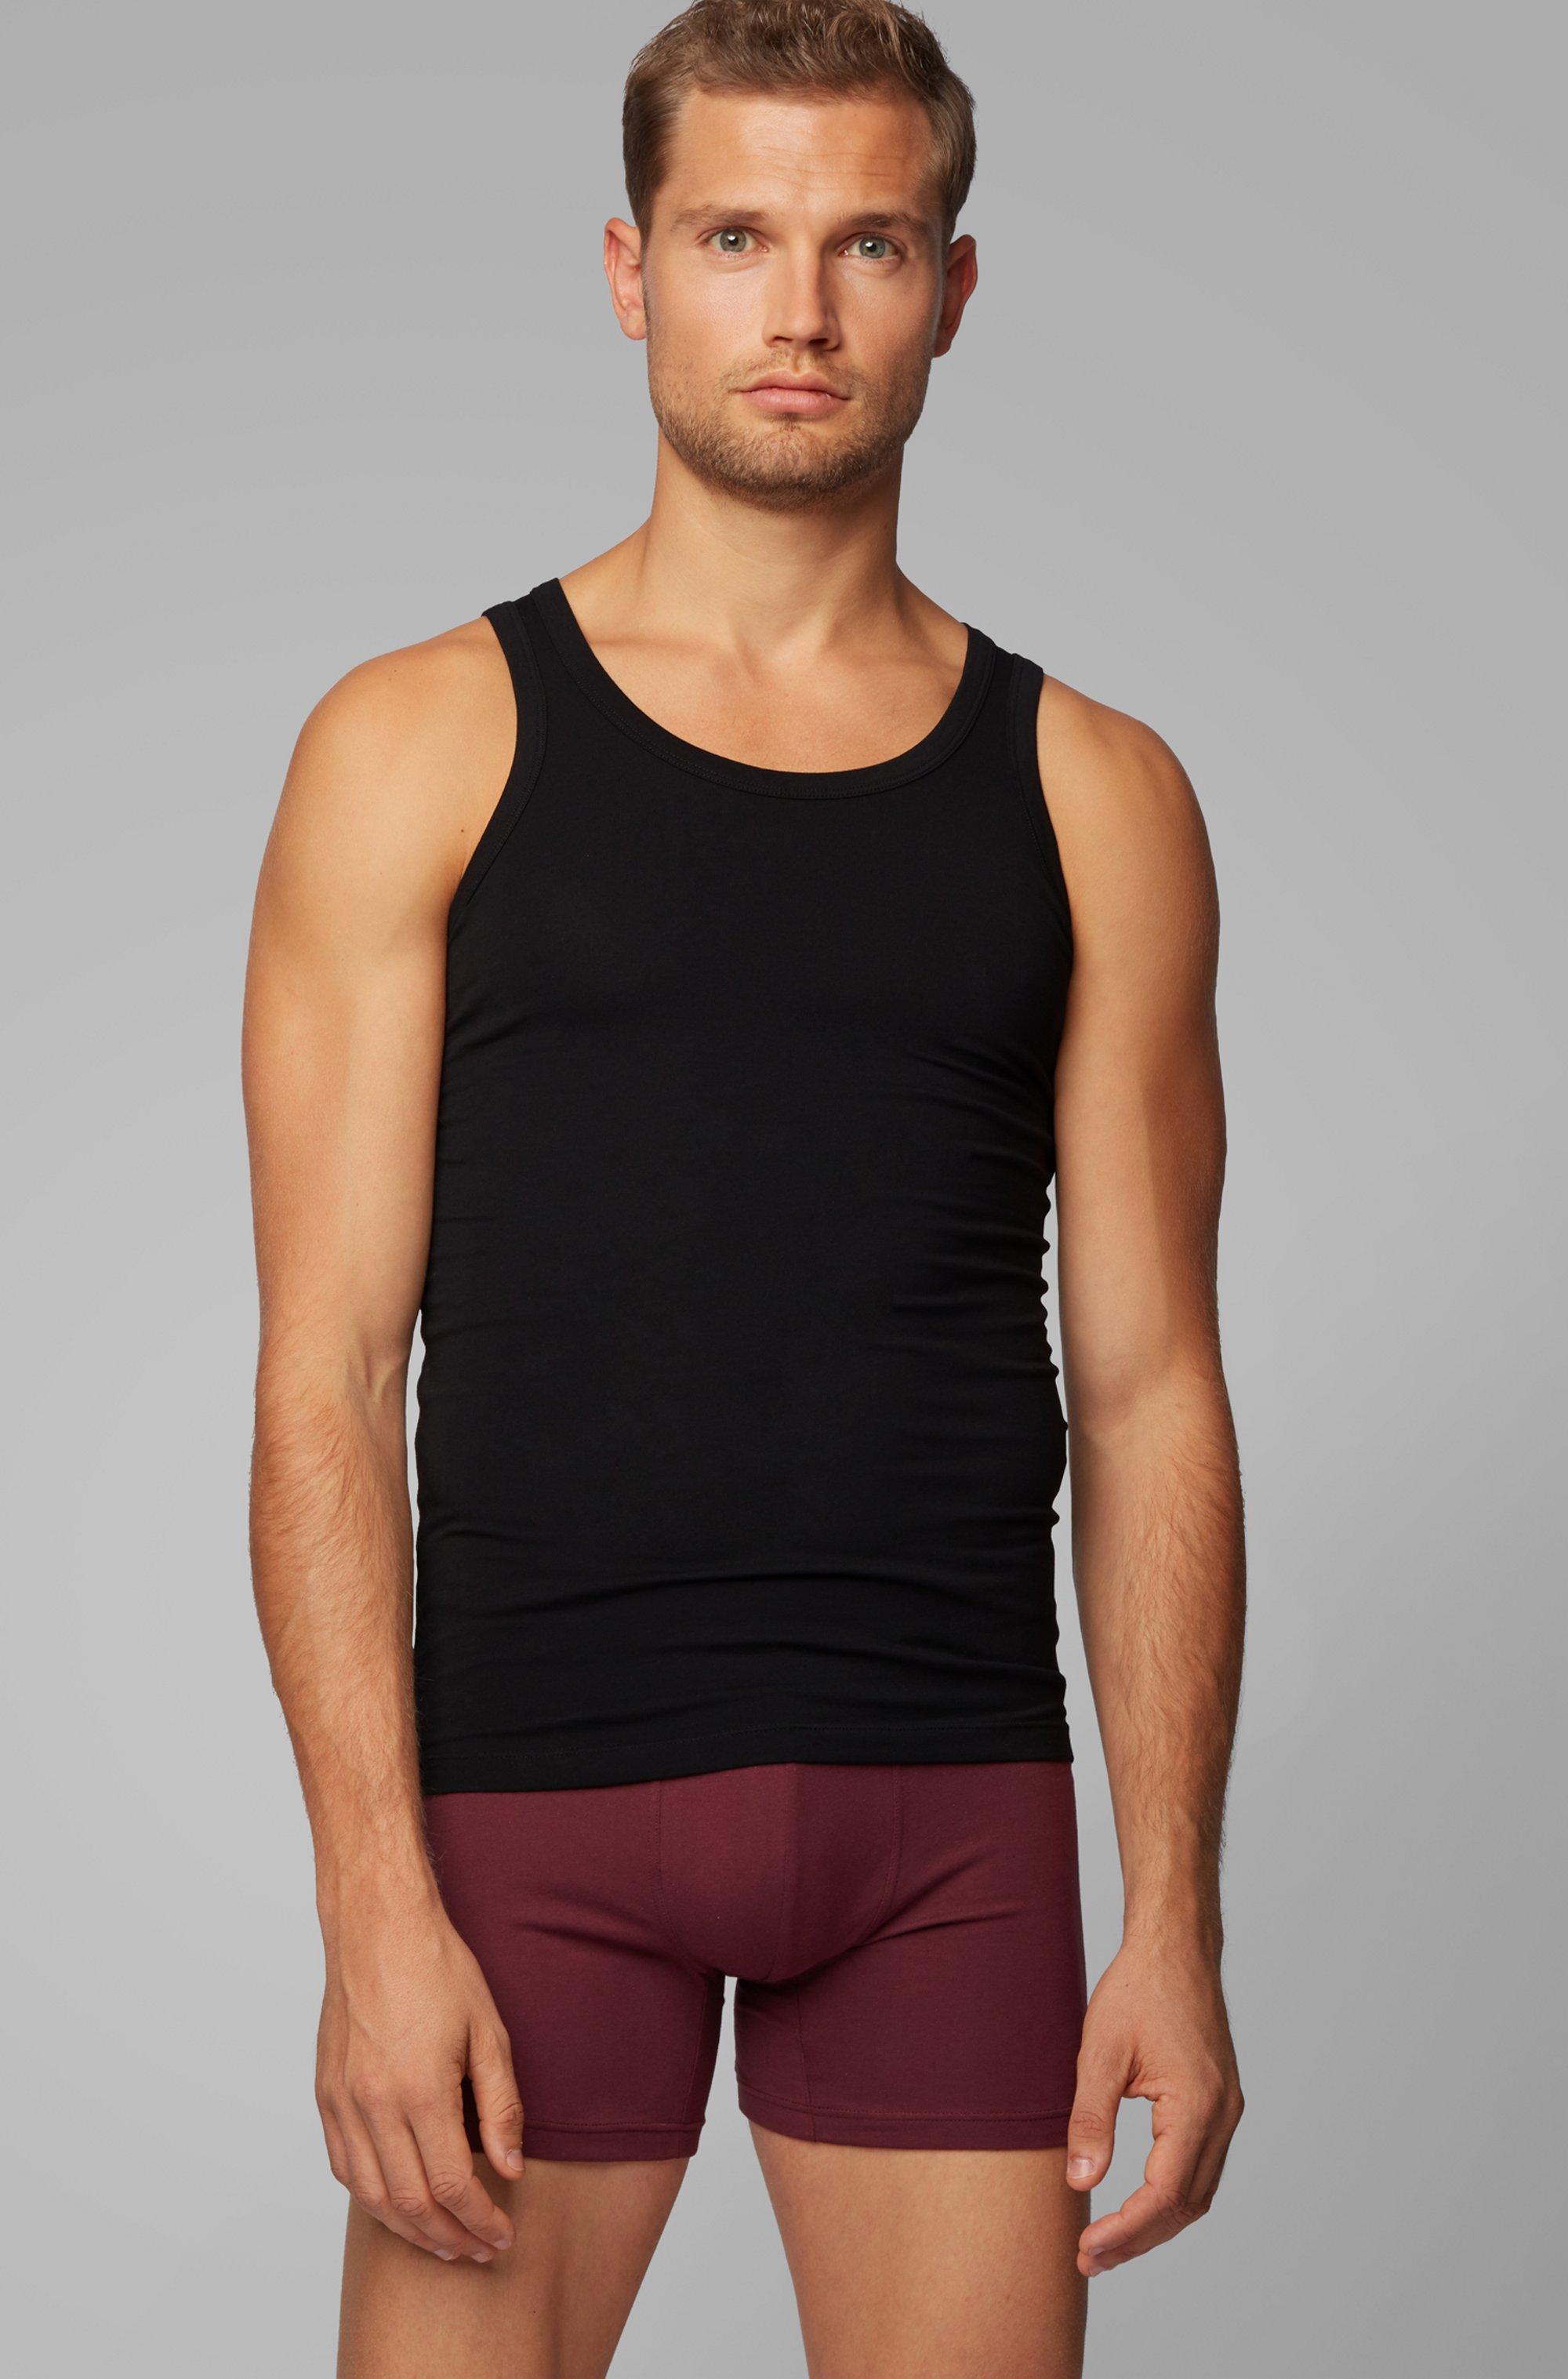 Two-pack of slim-fit underwear vests